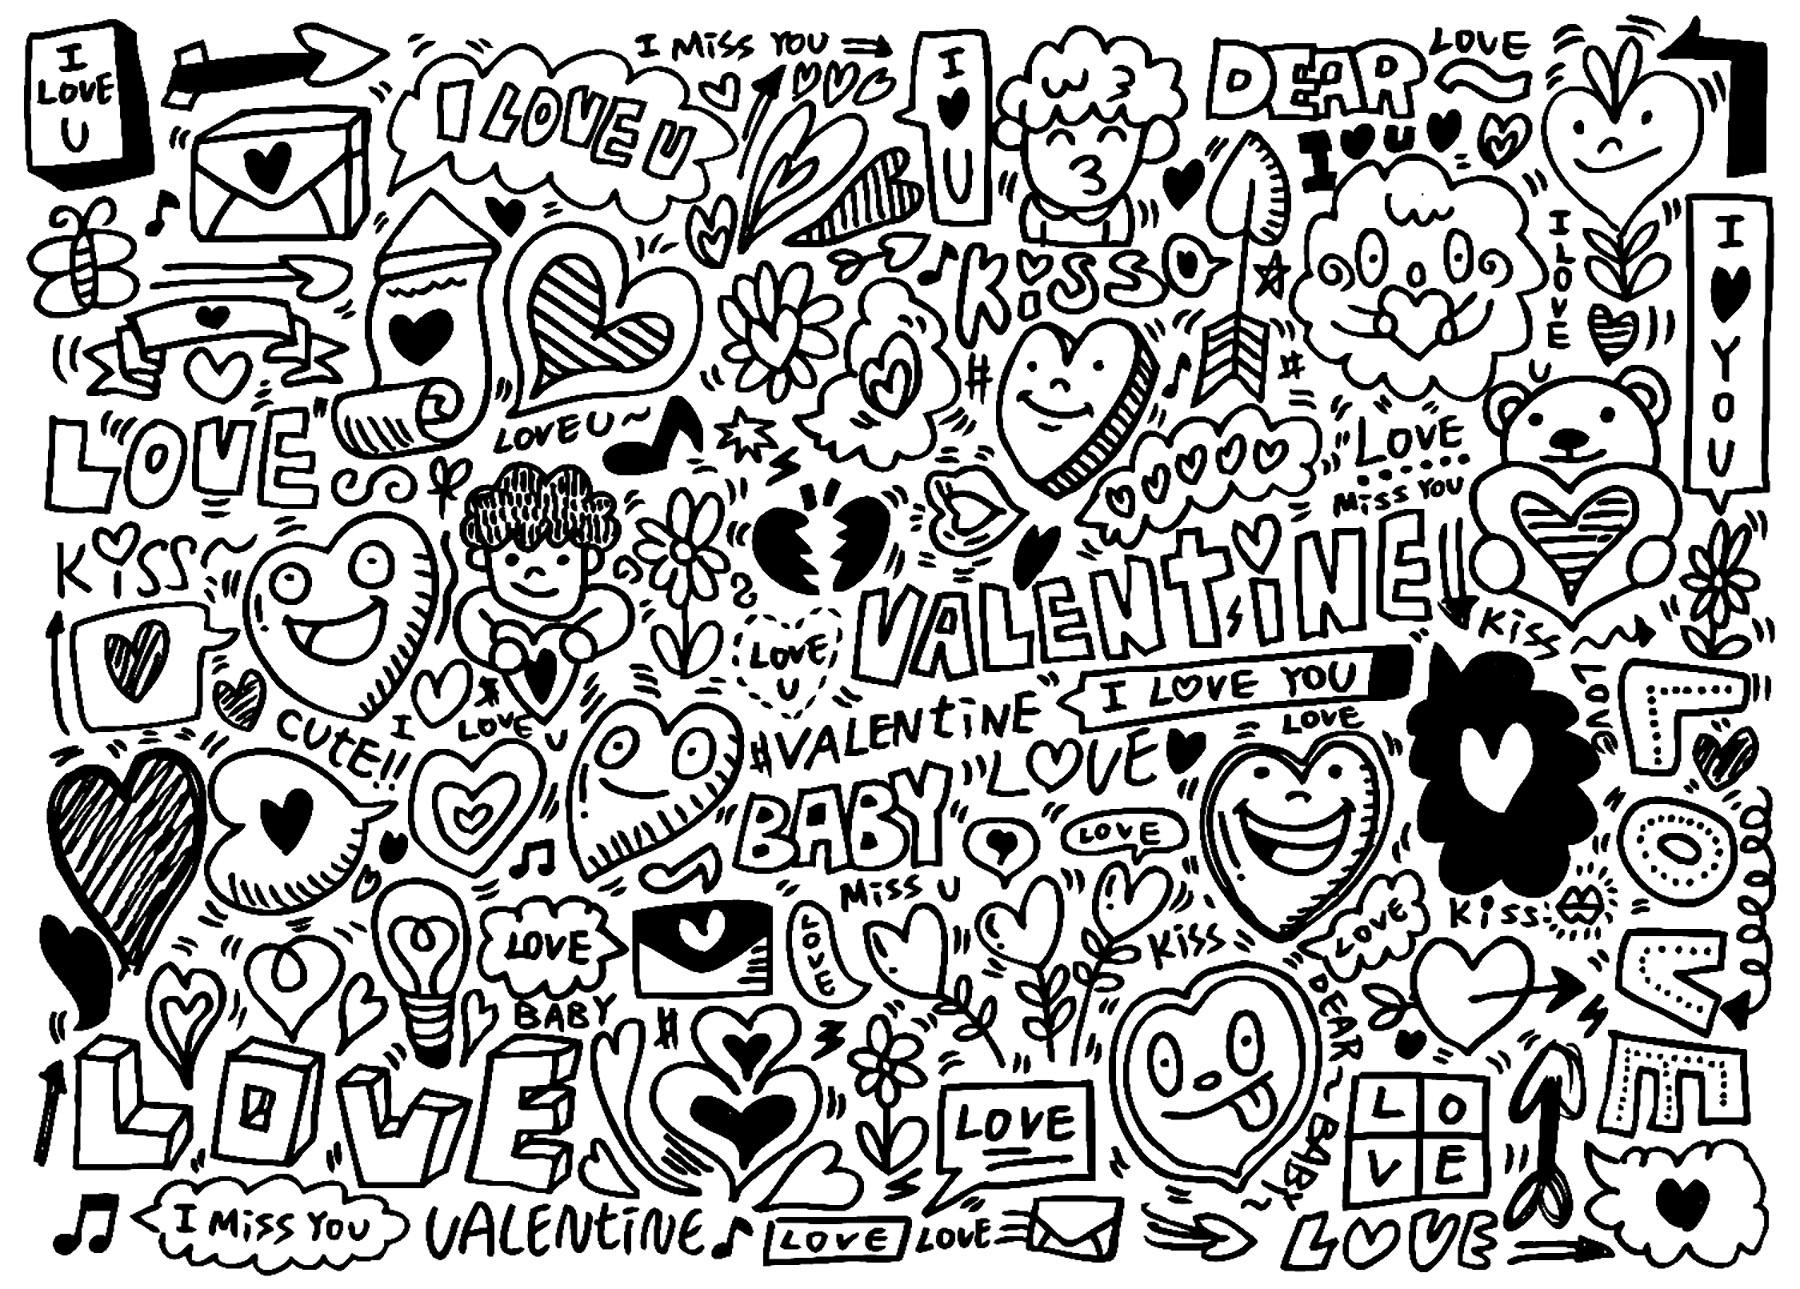 Doodle art doodling disegni da colorare per adulti - Pagine da colorare pesci per adulti ...